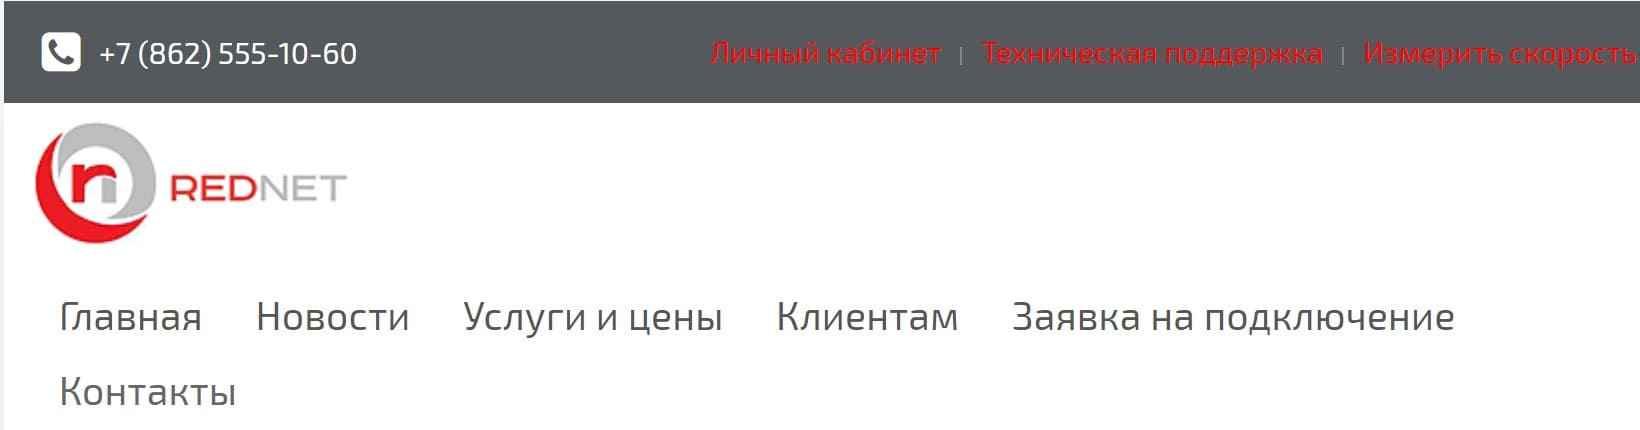 red-net.net личный кабинет